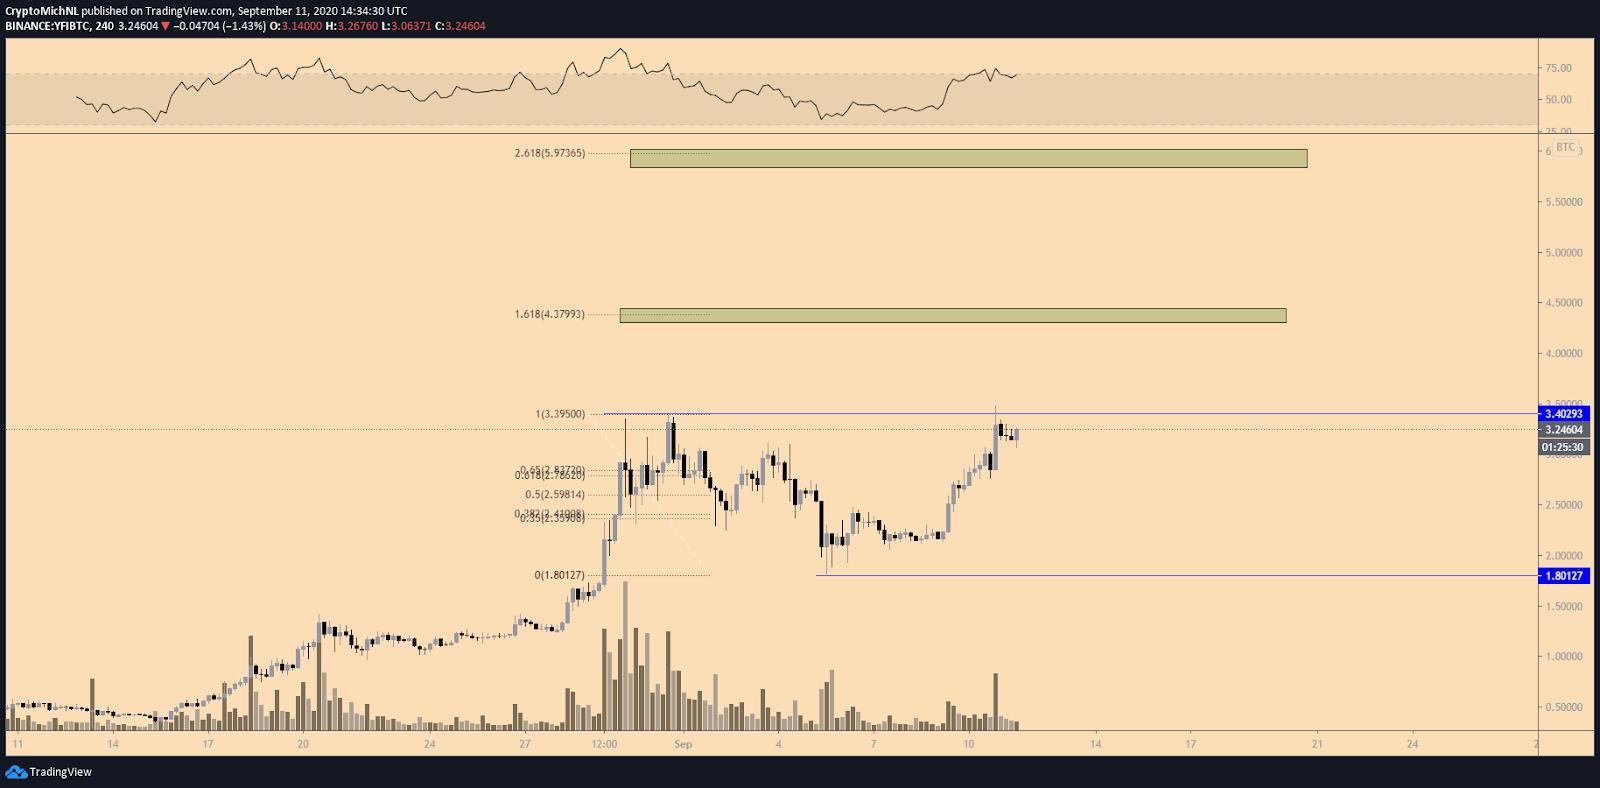 YFI/BTC 4-hour chart